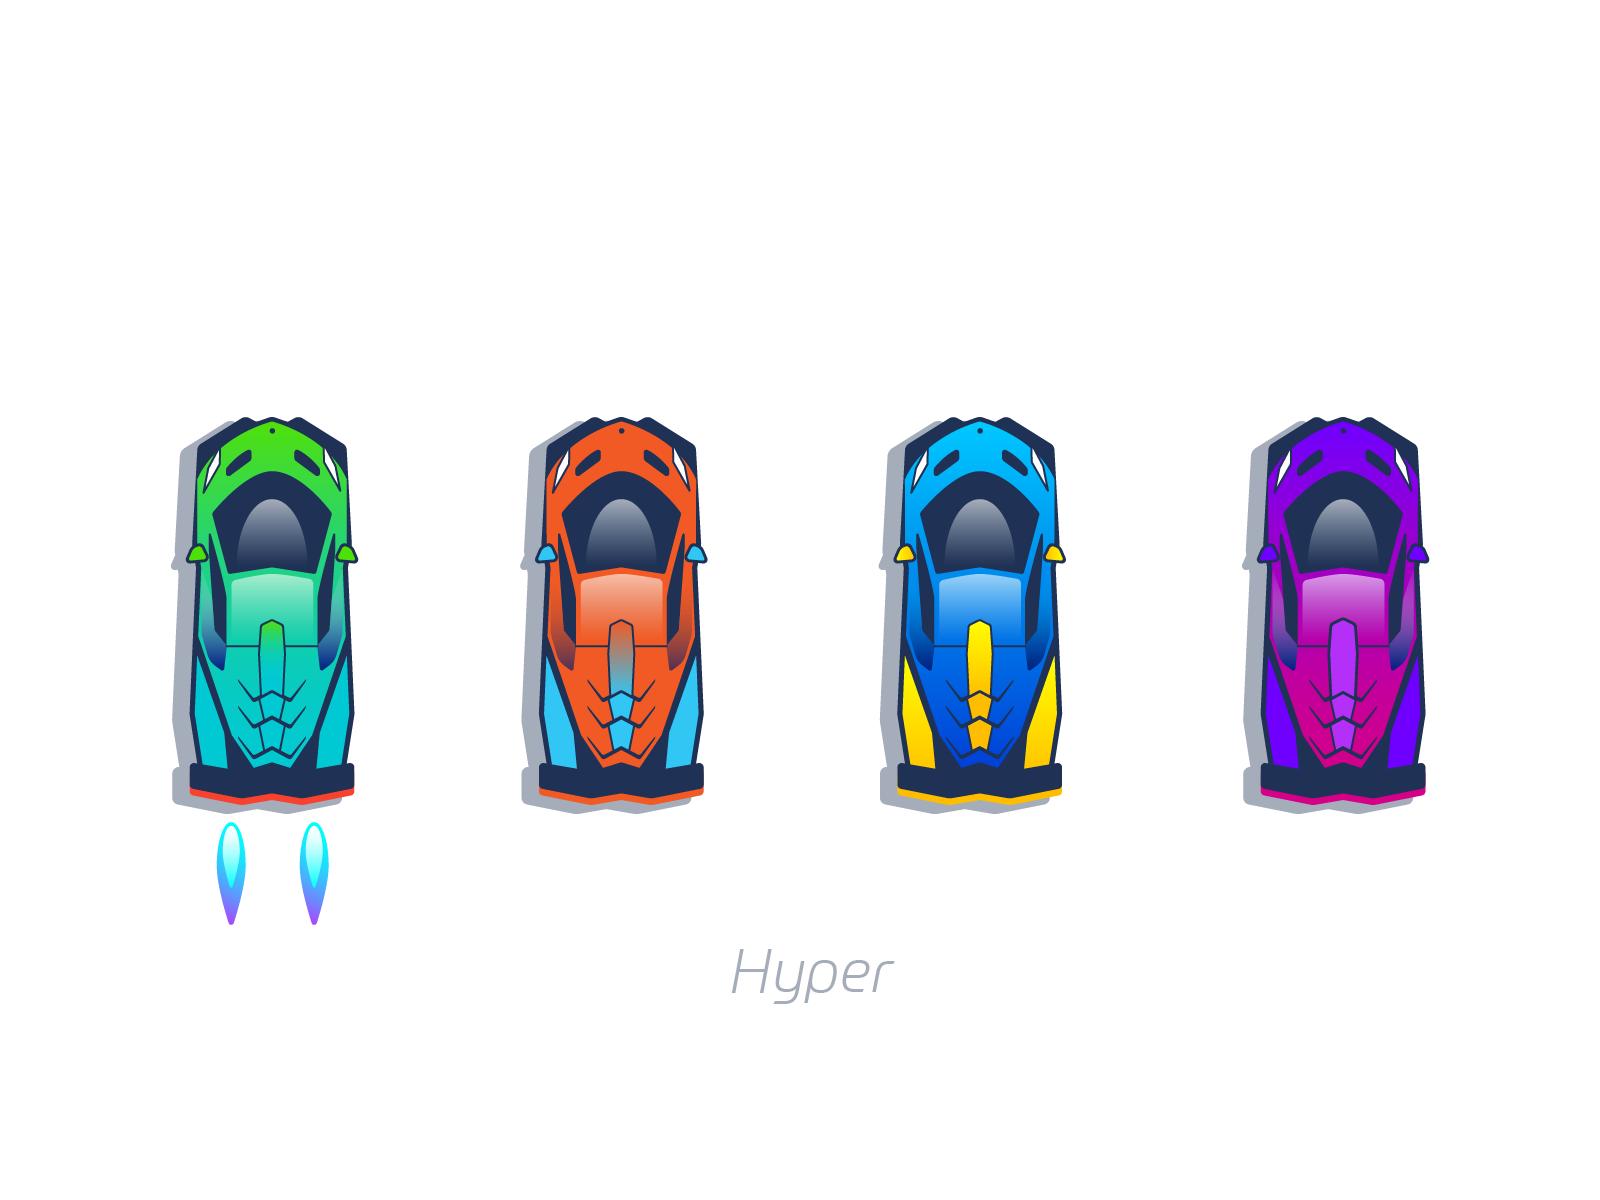 Hyper cars mobile design graphics